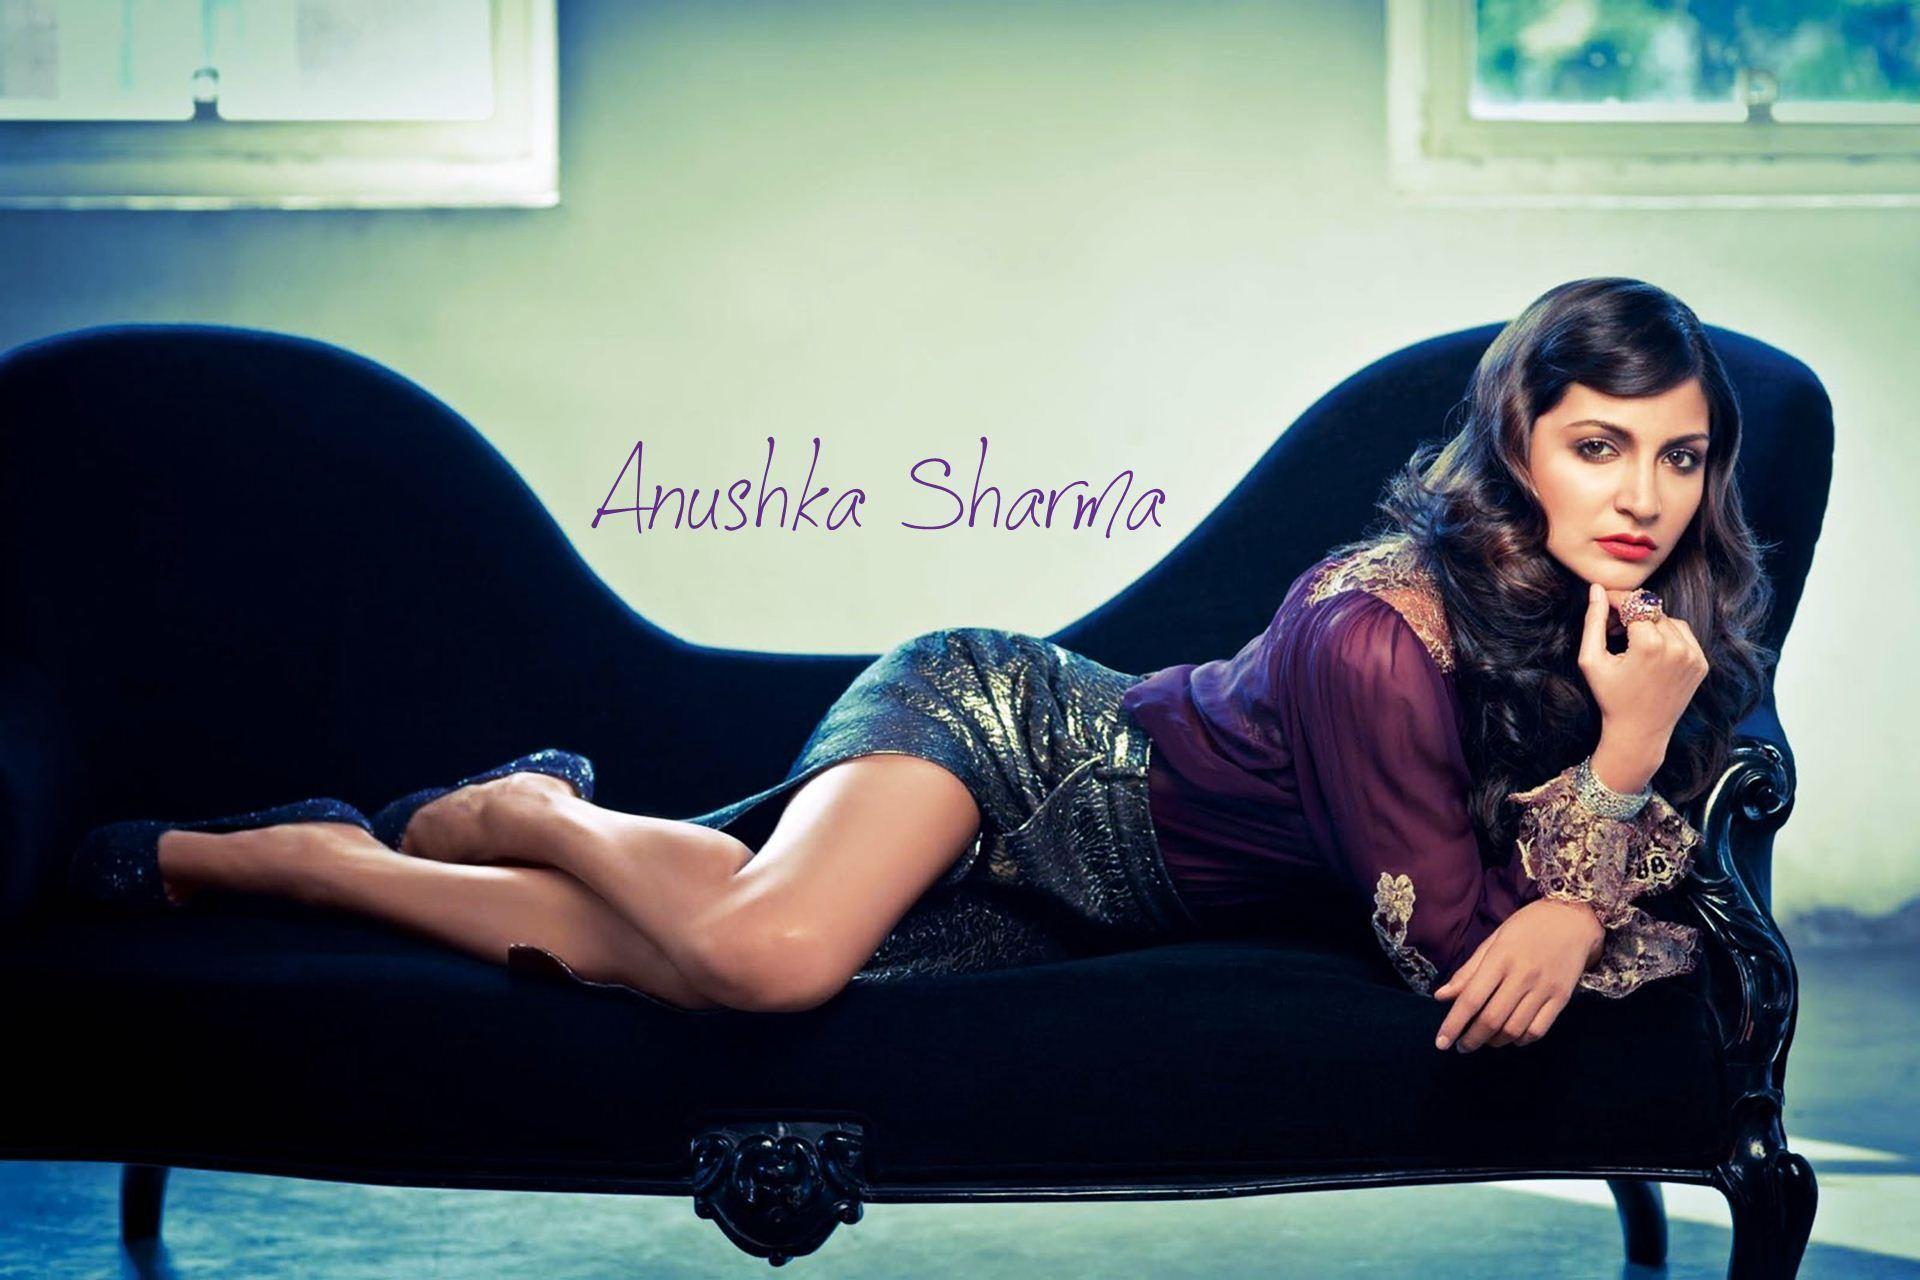 Anushka Sharma Hot Black Lingerie GQ Photoshoot Wallpaper